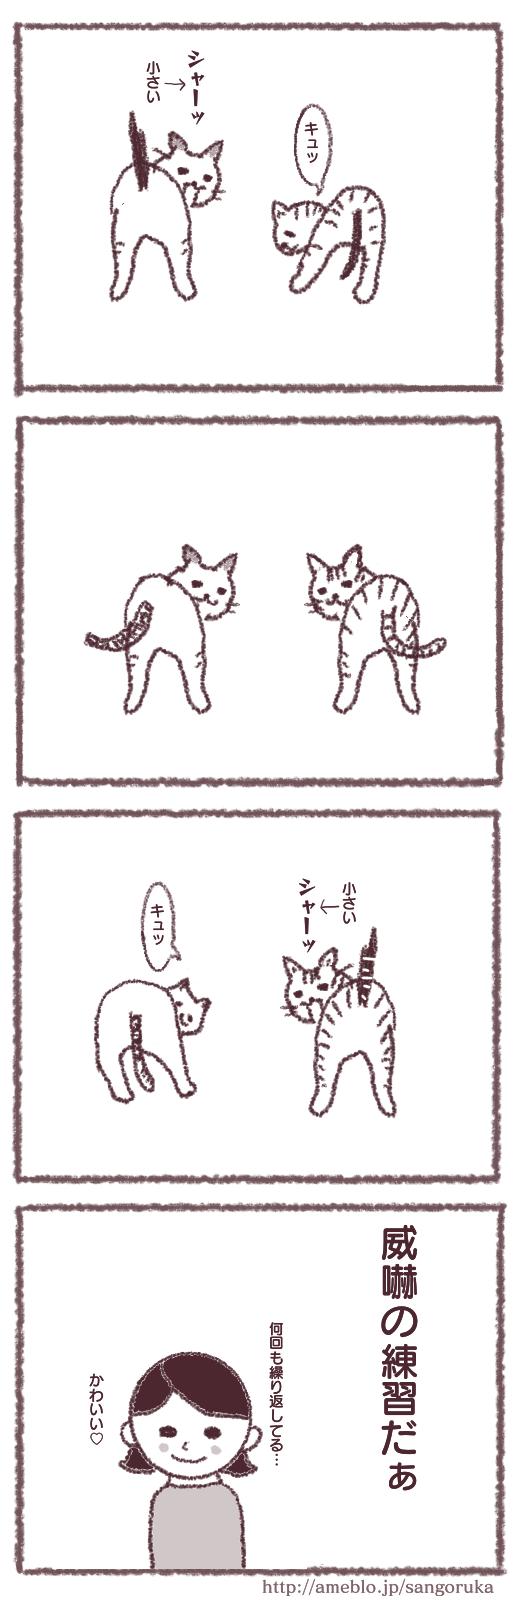 f:id:sangoruka_cats:20171107144044p:plain